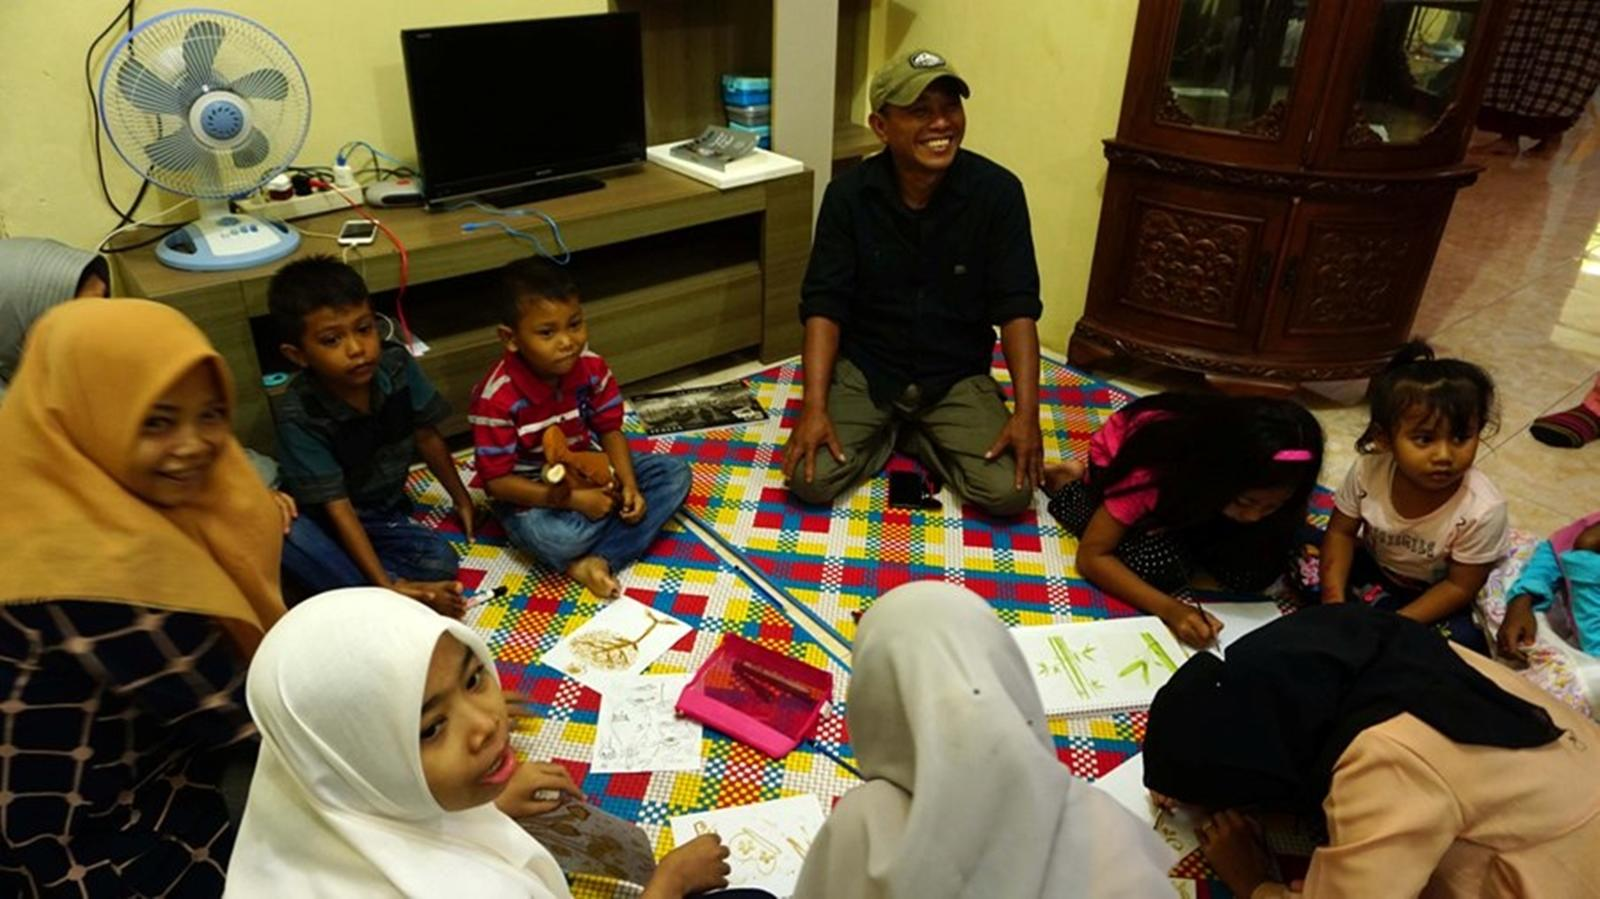 Pidie Baiq Beri Motivasi Anak-anak Pengidap Thalassemia di Aceh